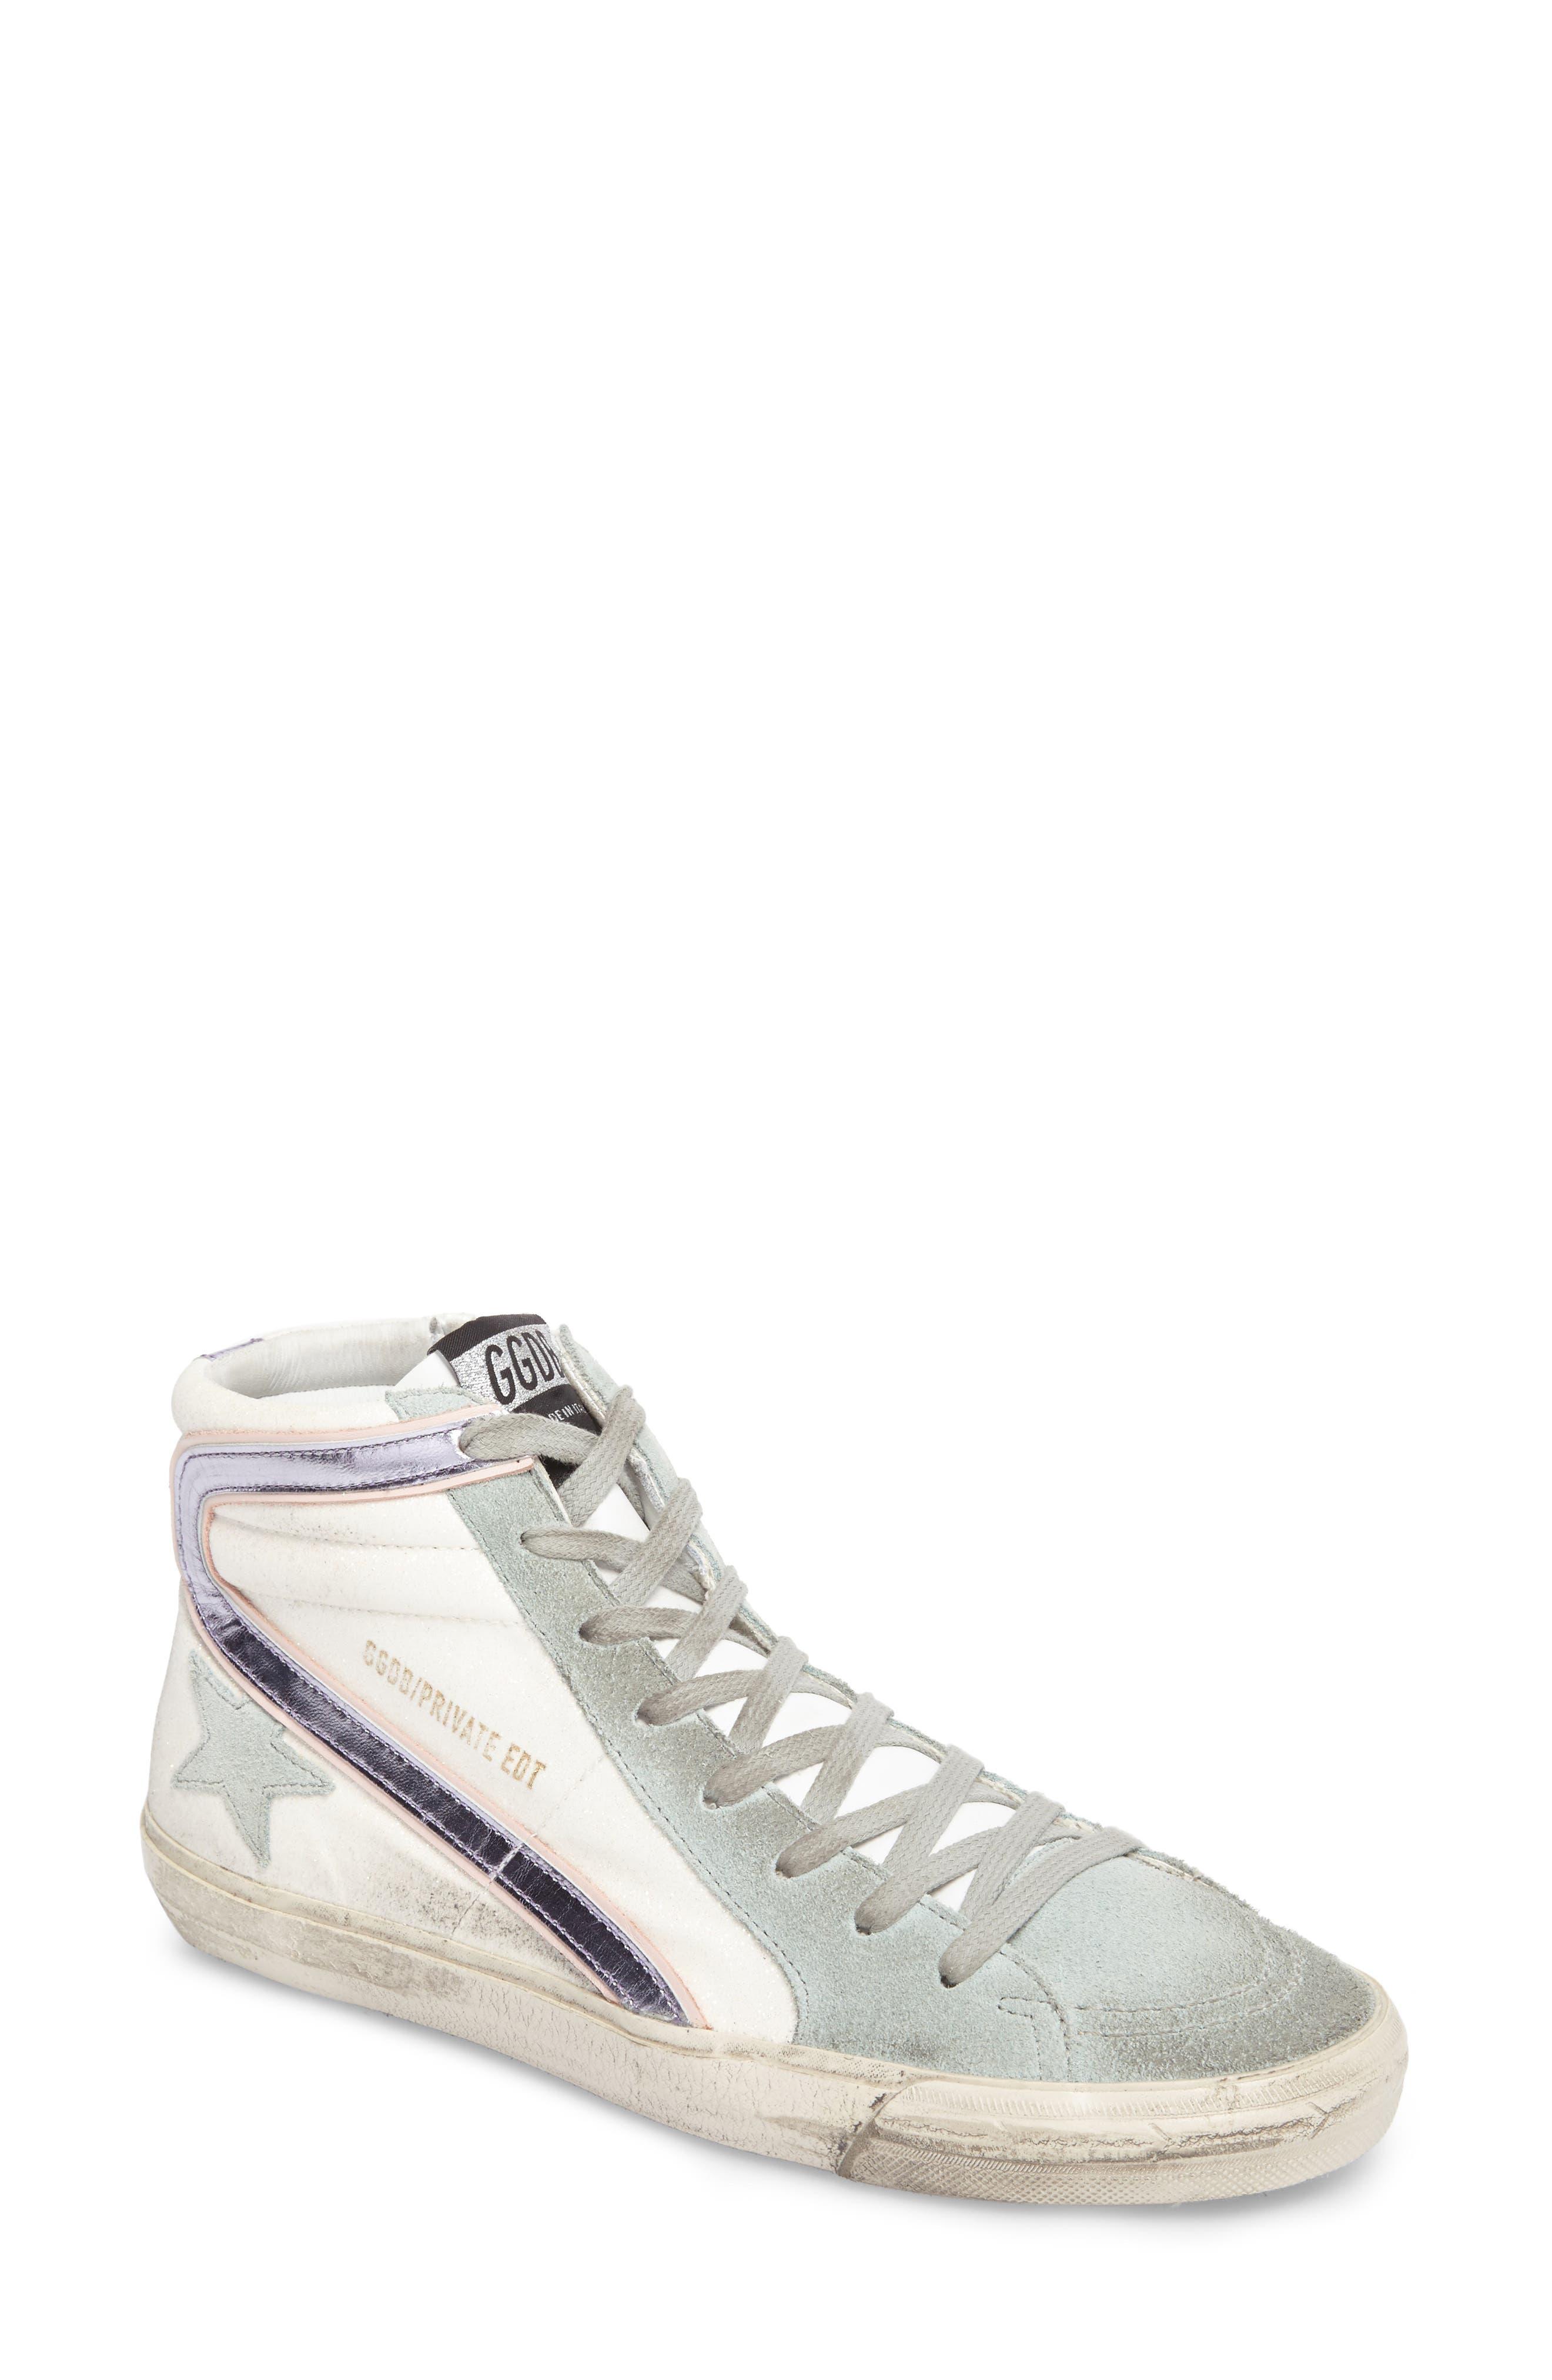 Slide High Top Sneaker,                             Main thumbnail 1, color,